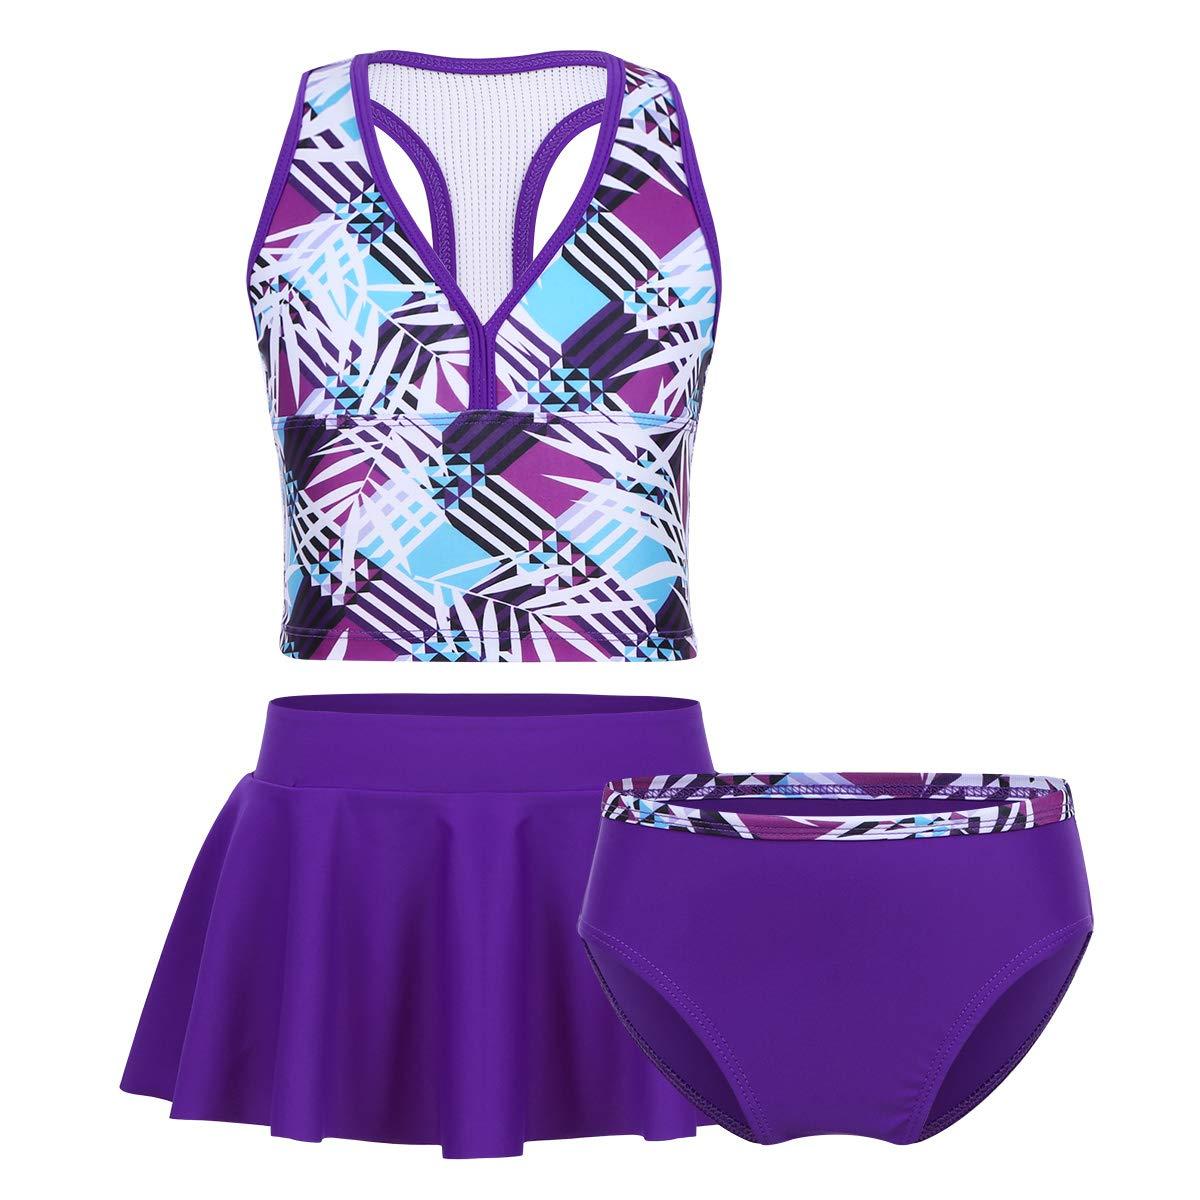 Freebily Teens Girls 3Pcs Tankini Swimsuit Boyshort Top Bottom Set Kids Floral Printed Summer Beach Swimwear